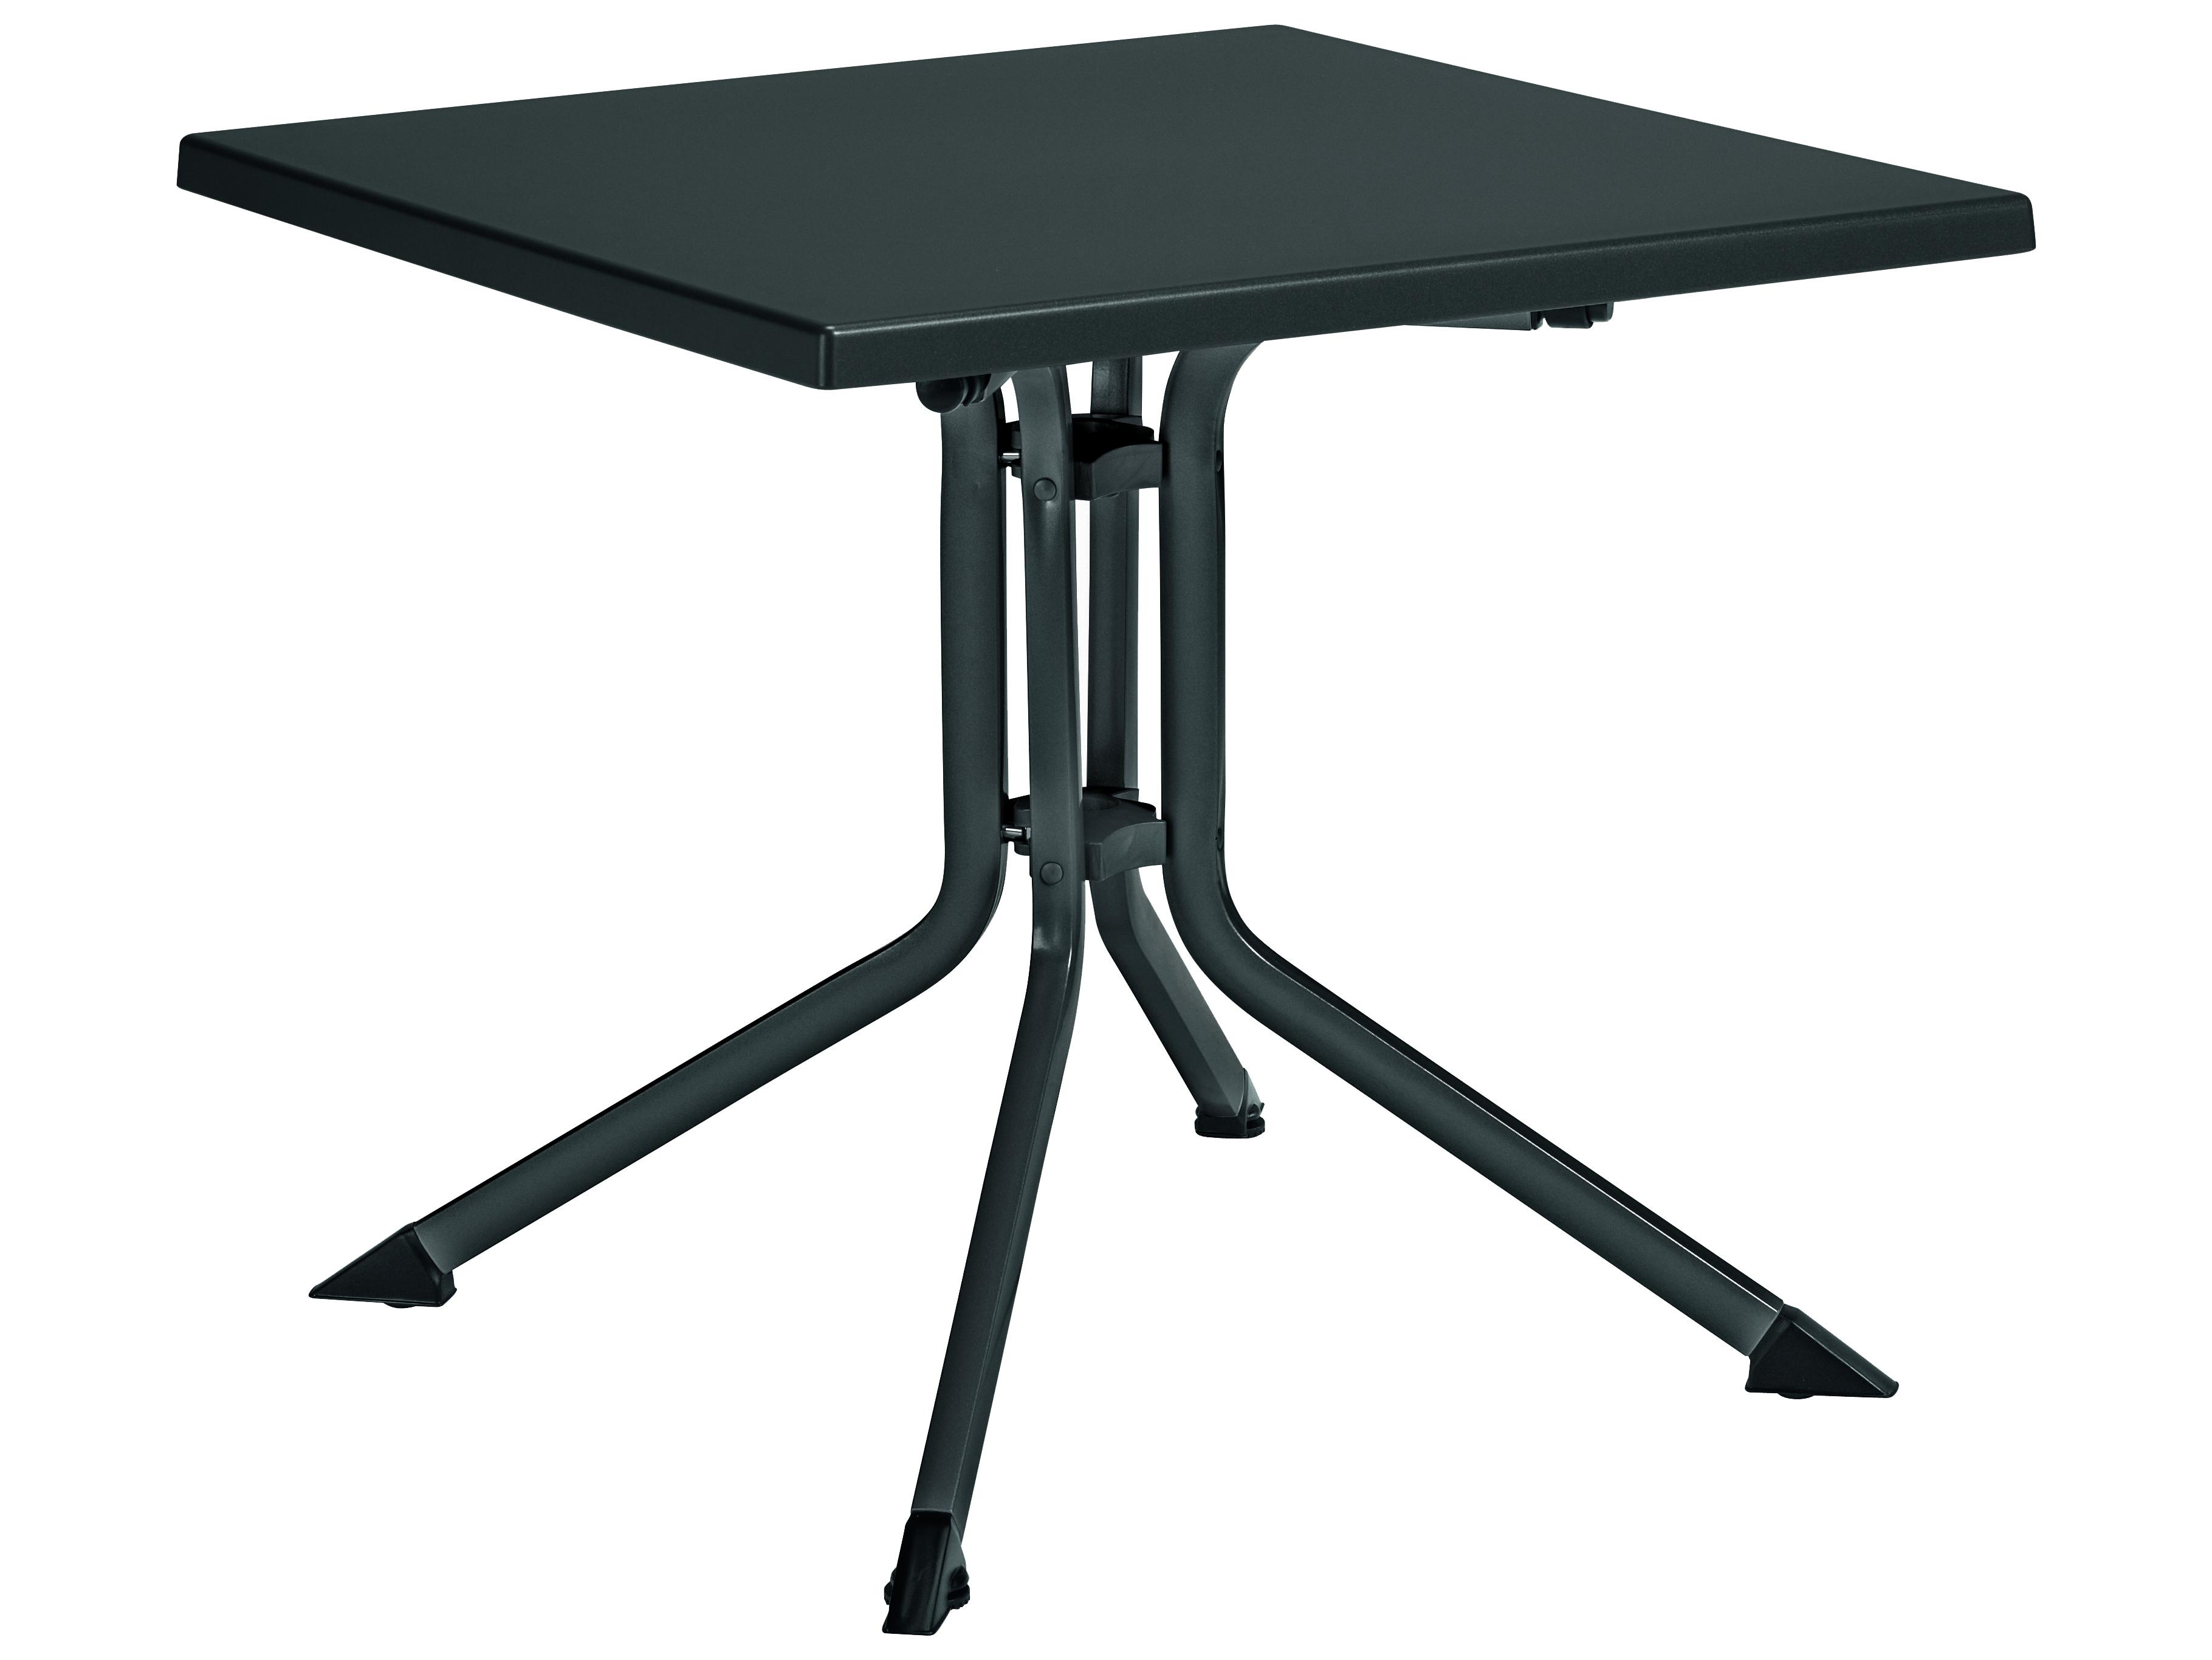 Kettler 32 Square Folding Table Gray Gray 307018 7100